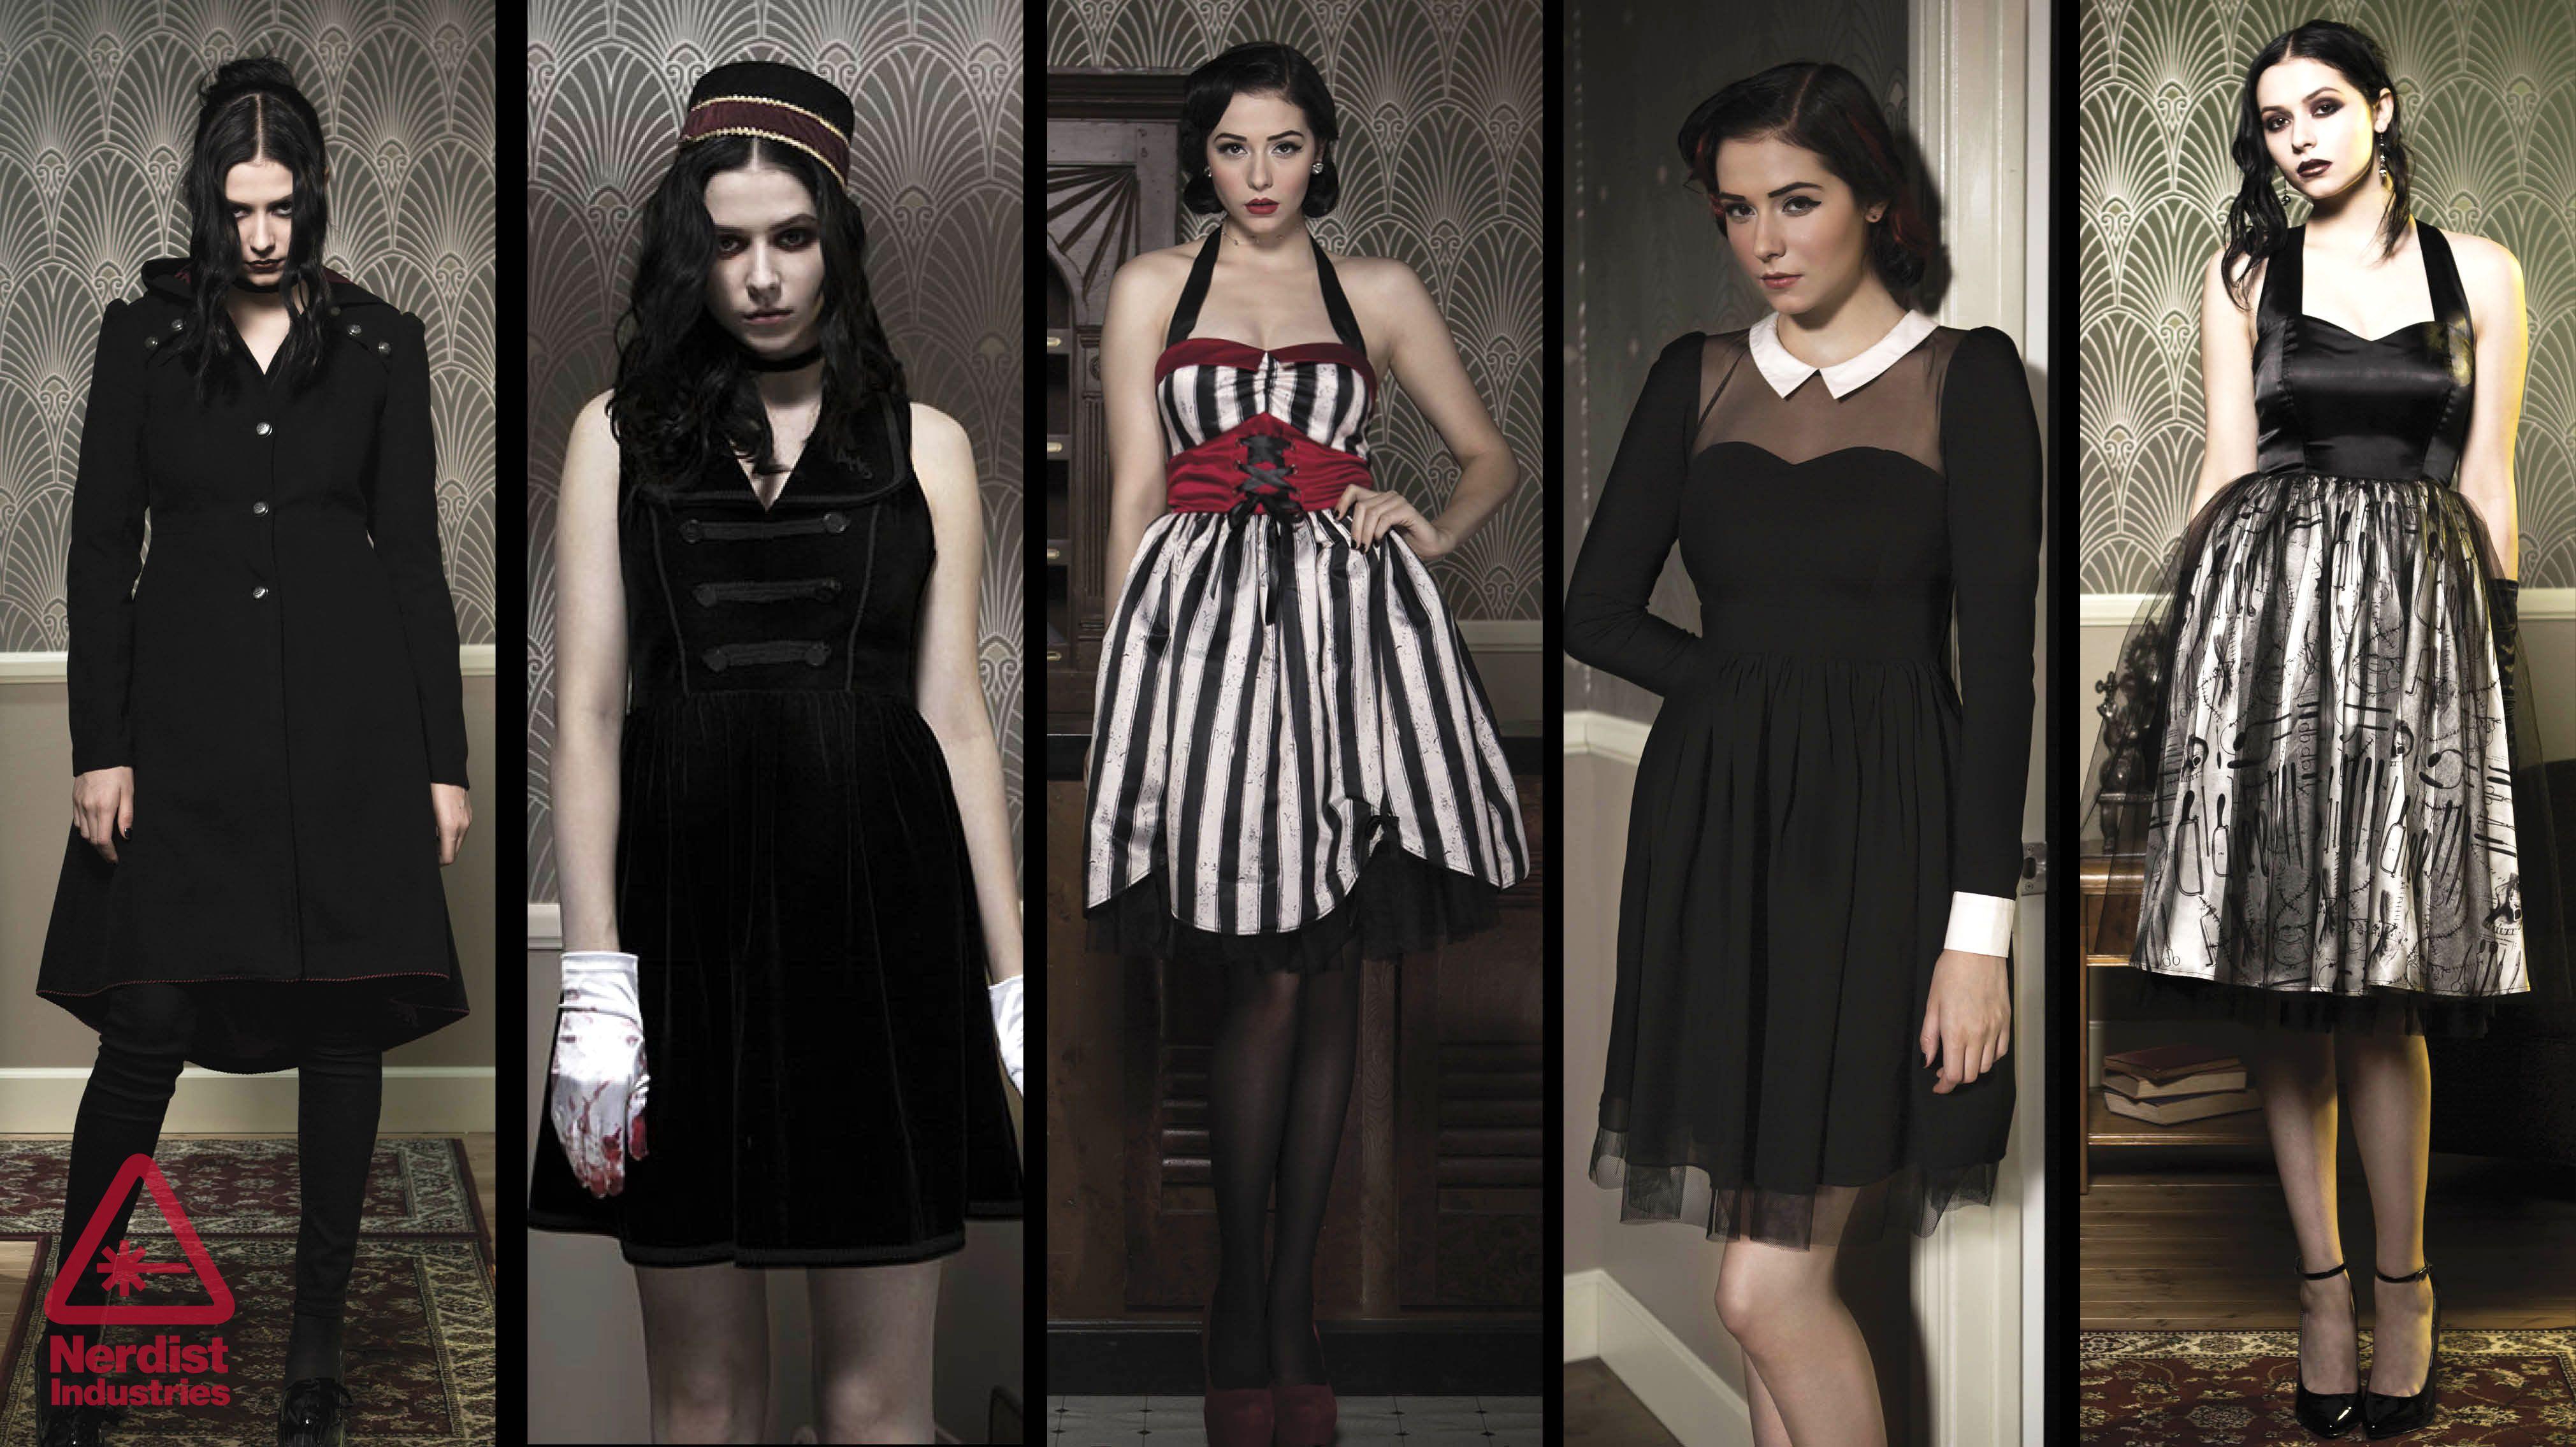 Hot Topic Launching American Horror Story Fashion